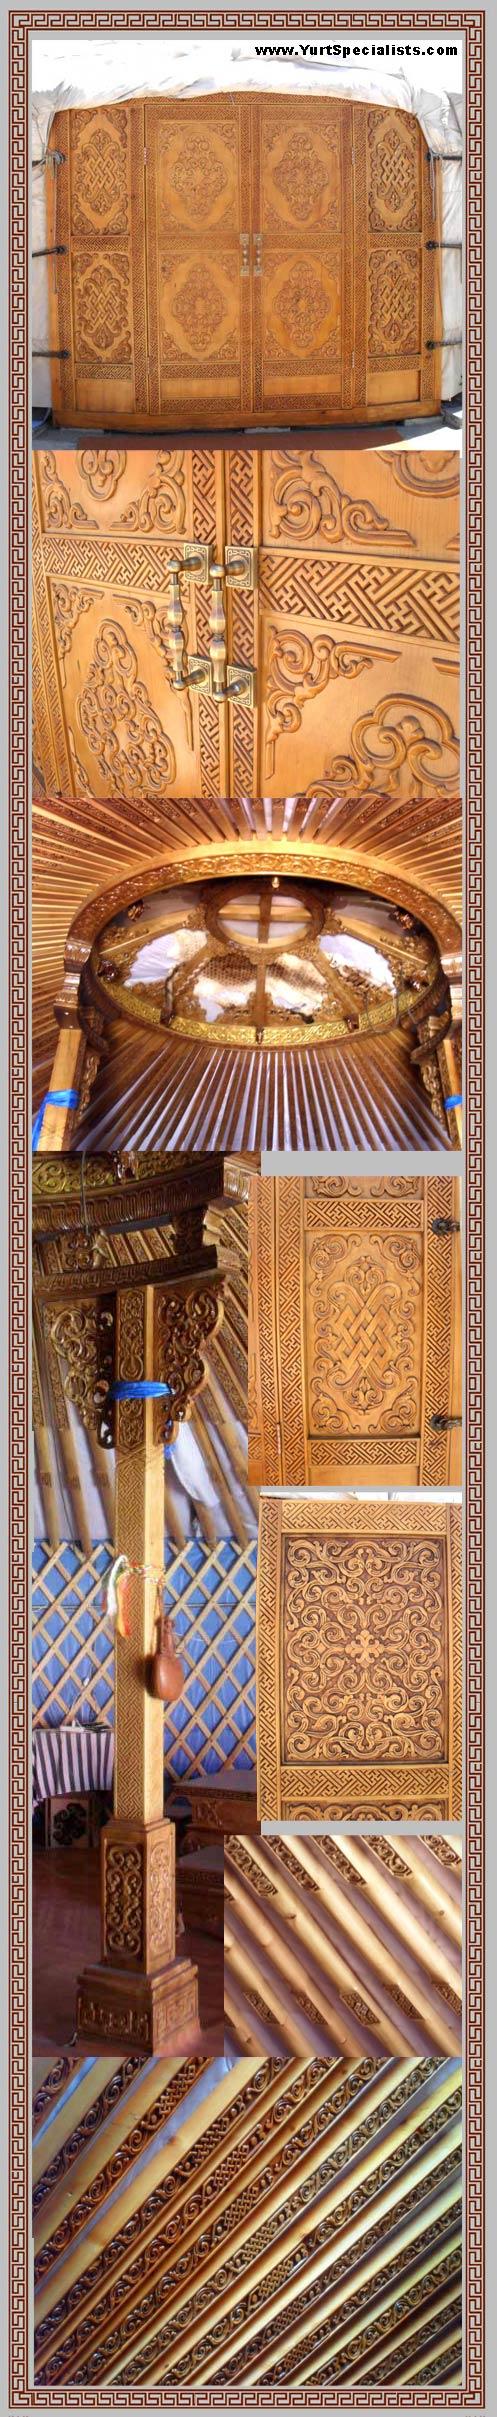 carved-yurt